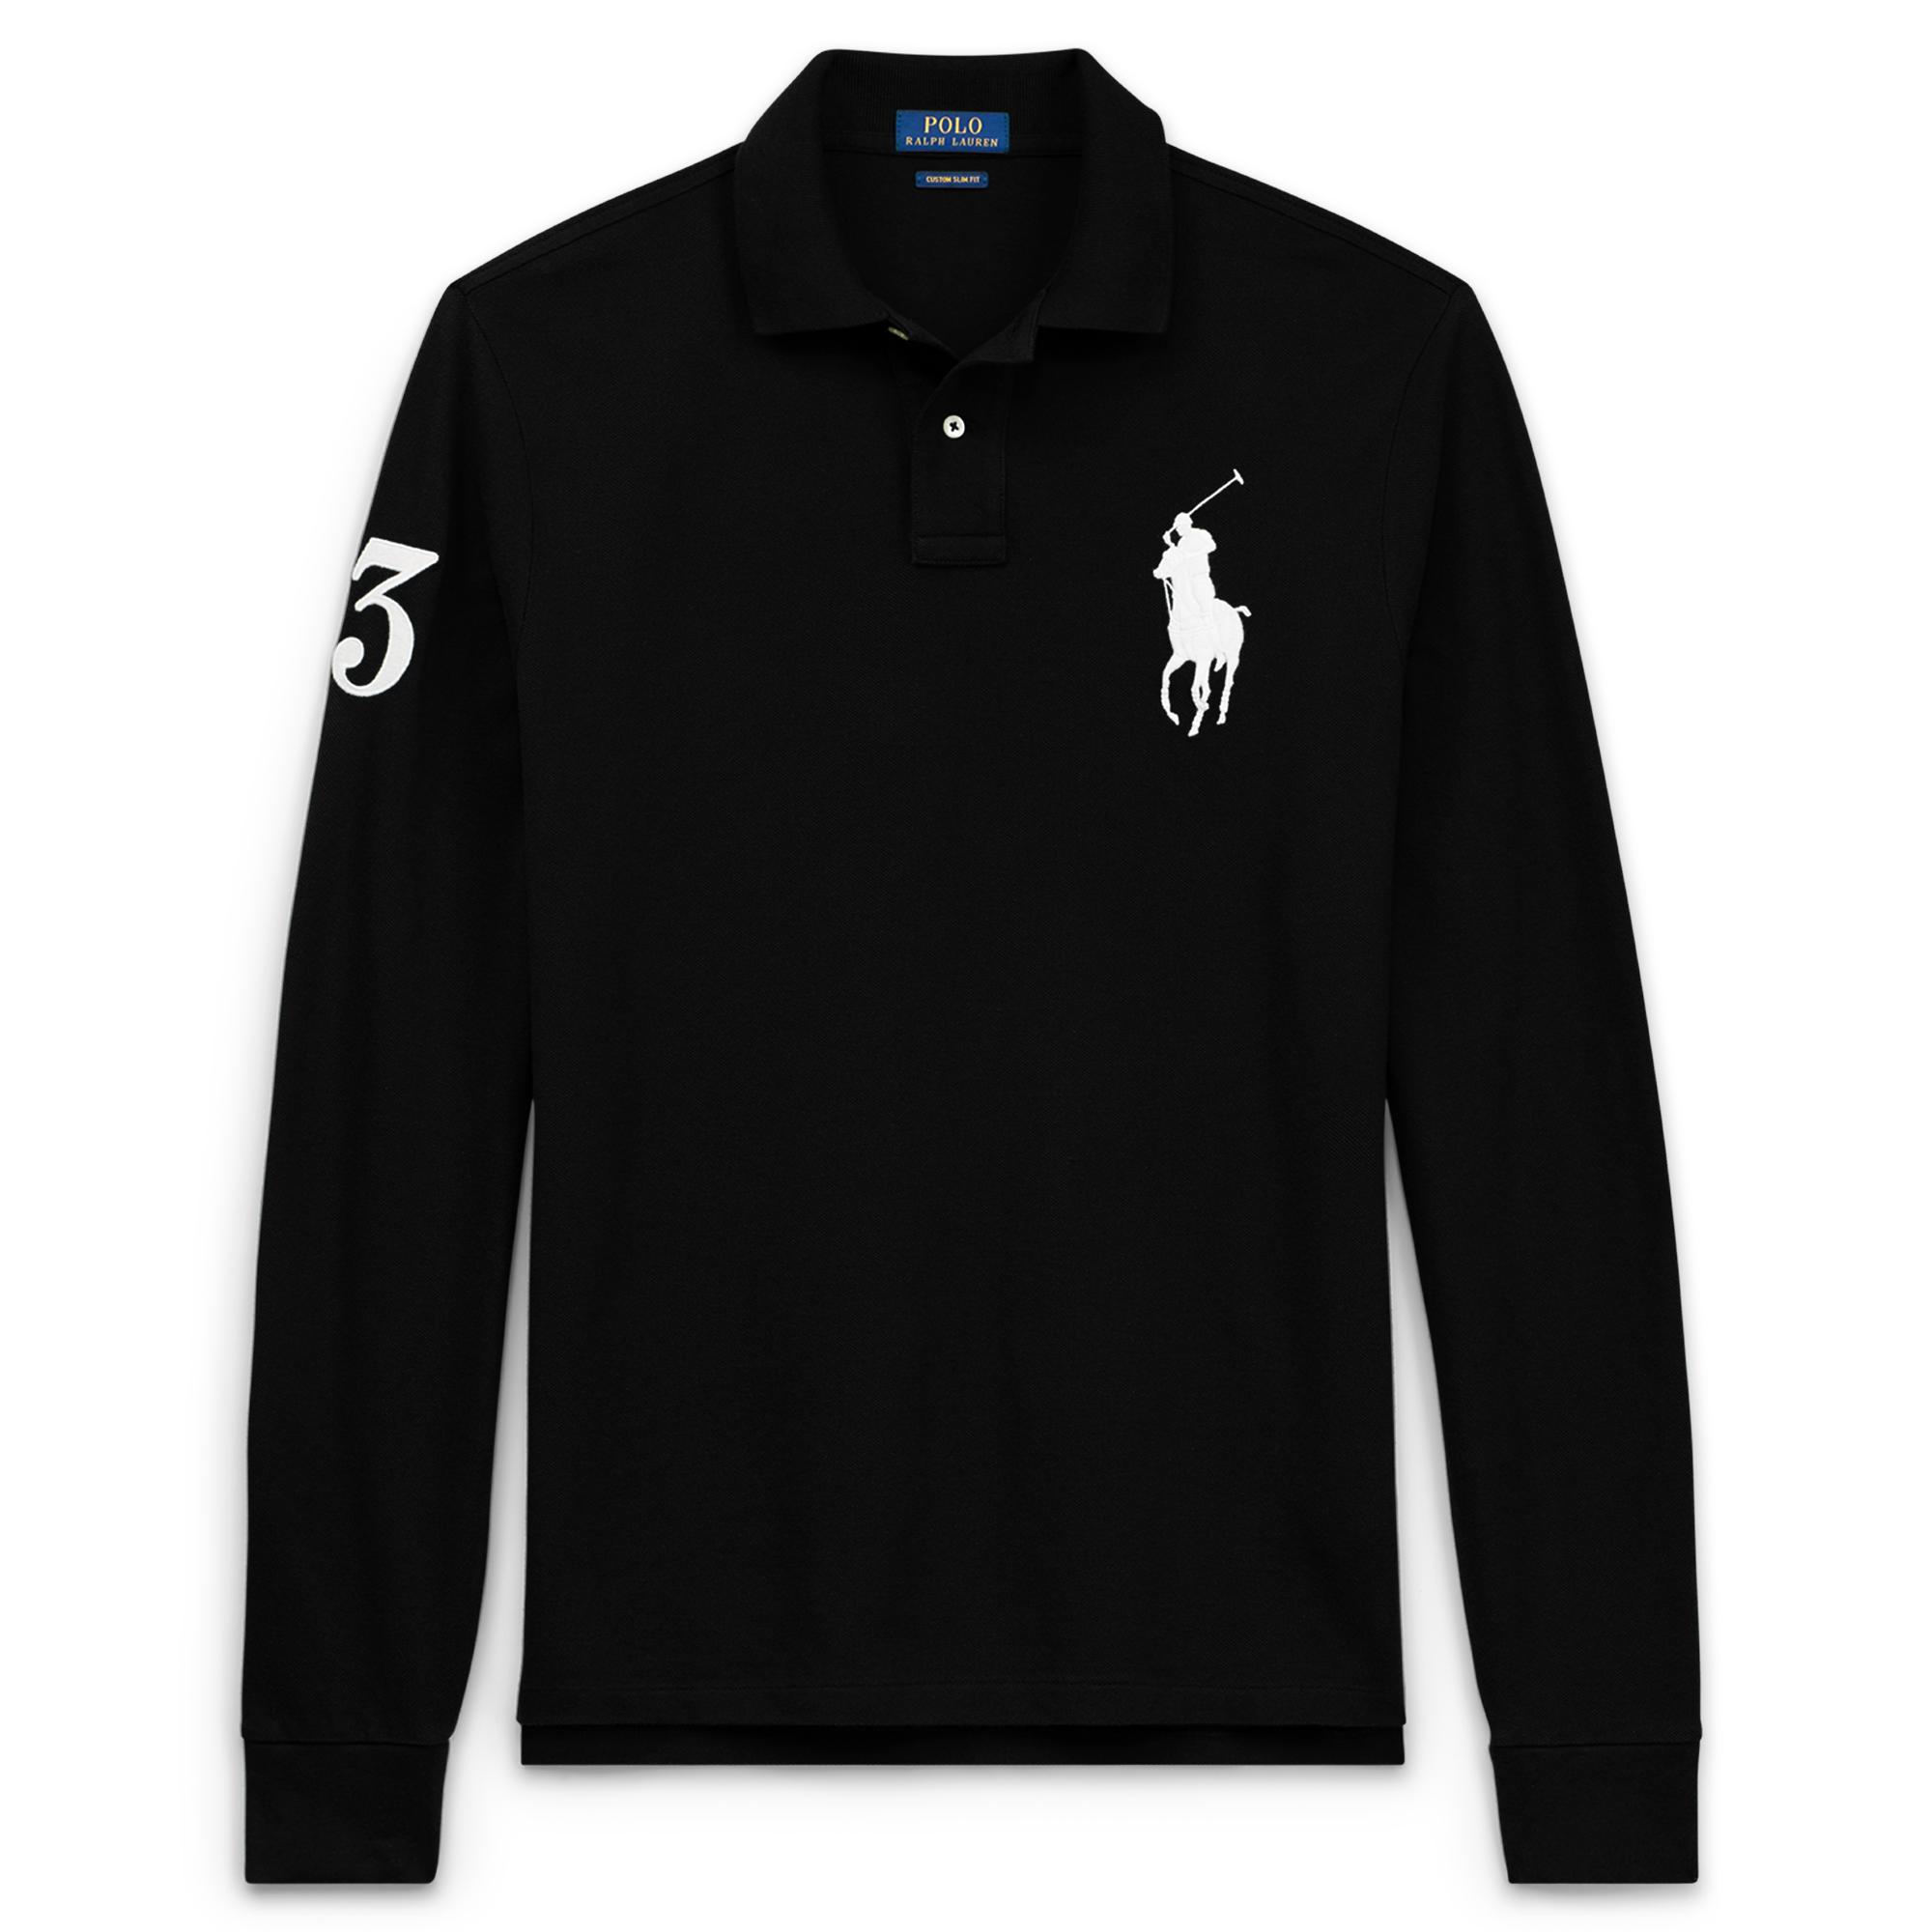 Customizable Ralph Lauren Polo Shirts